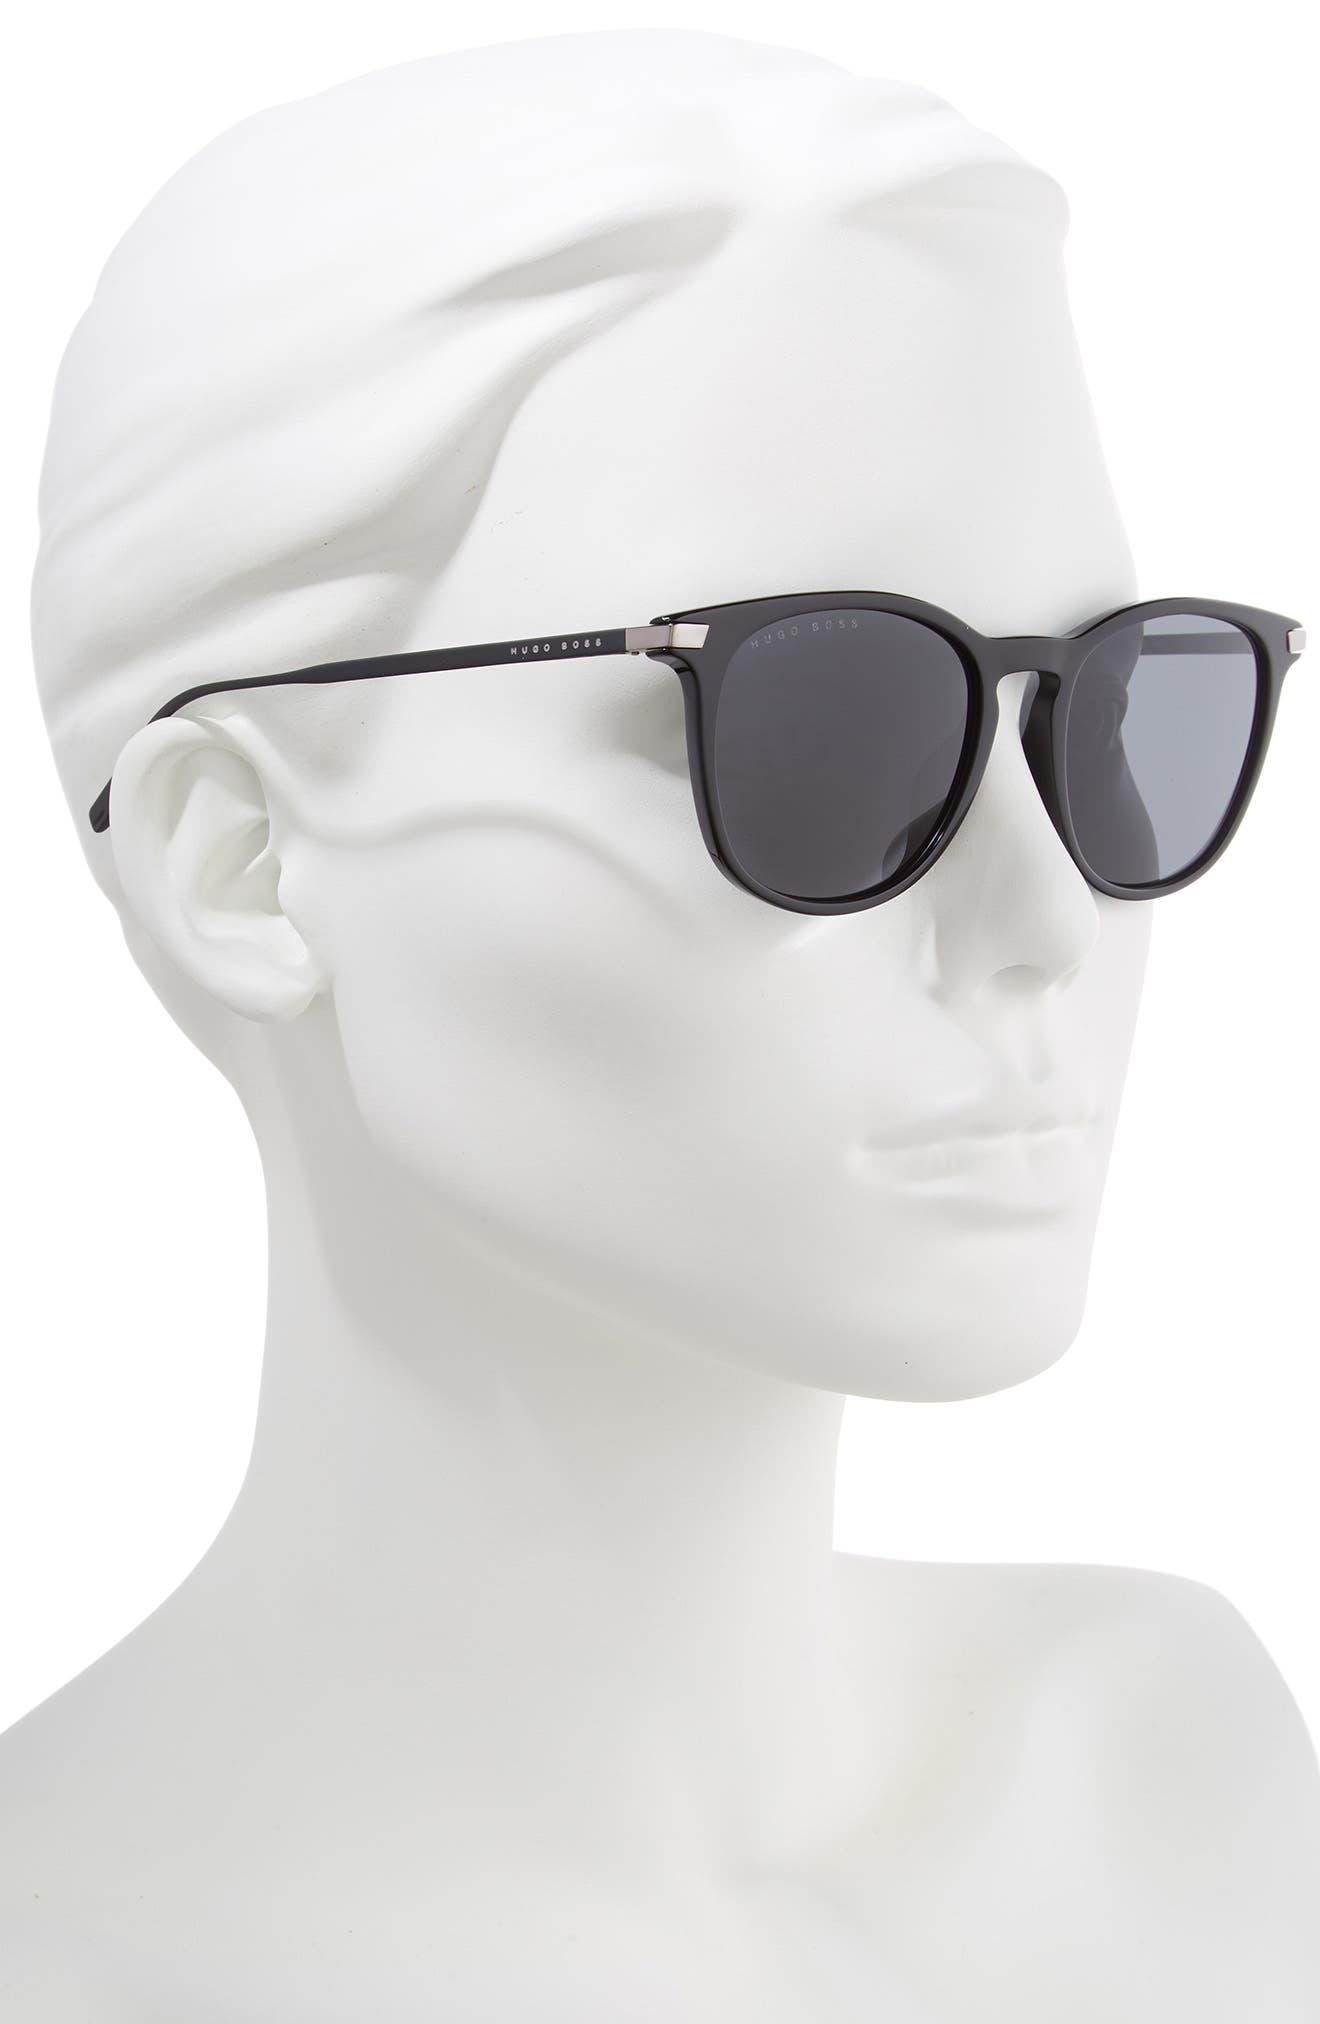 53mm Sunglasses,                             Alternate thumbnail 2, color,                             BLACK